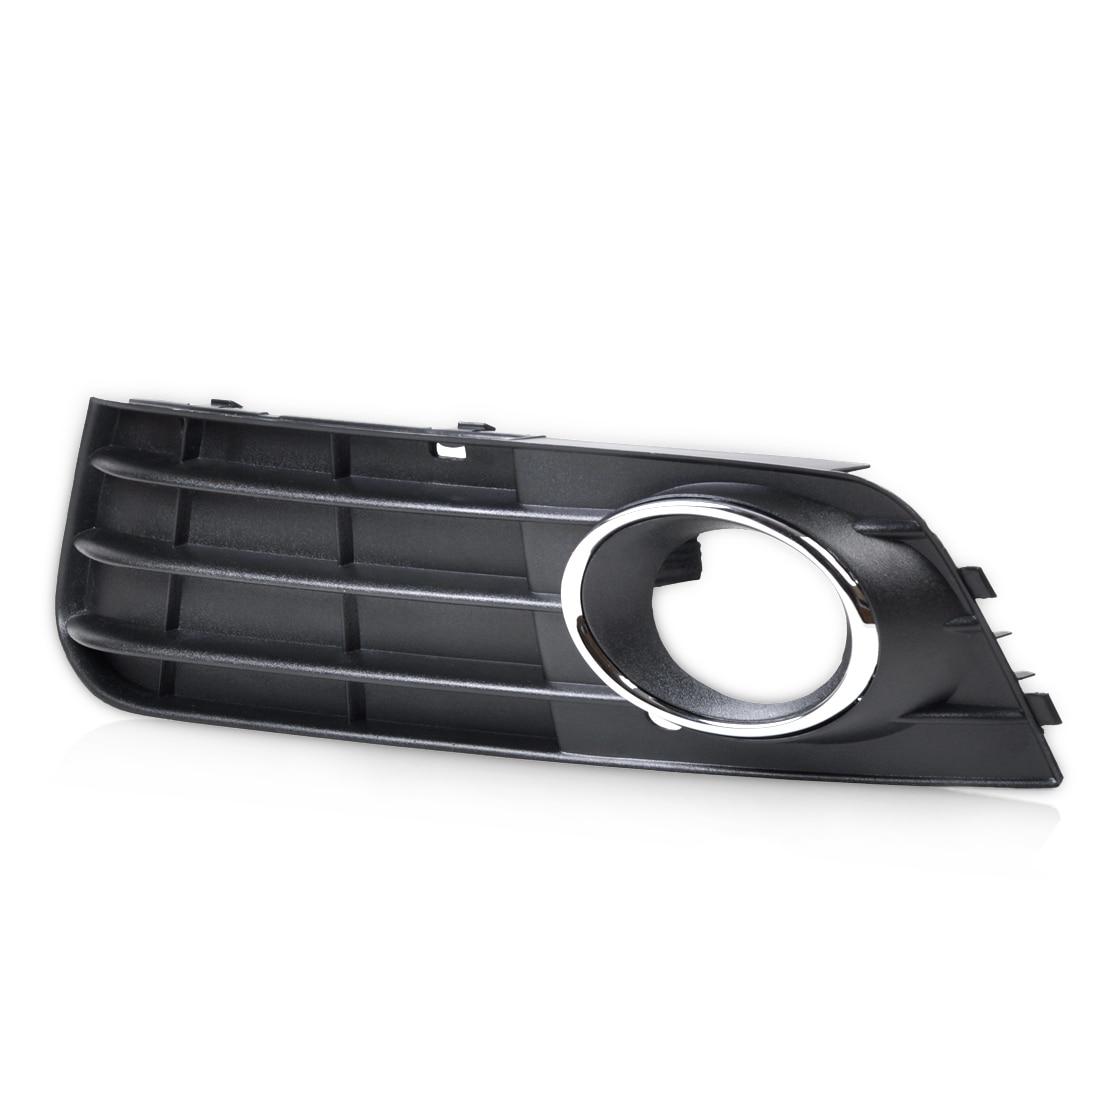 CITALL 8K0807681A01C 8K0807681A 1Pc Black Front Left Bumper Fog Light Lamp Cover Grille for Audi A4 B8 2008 2009 2010 2011 2012